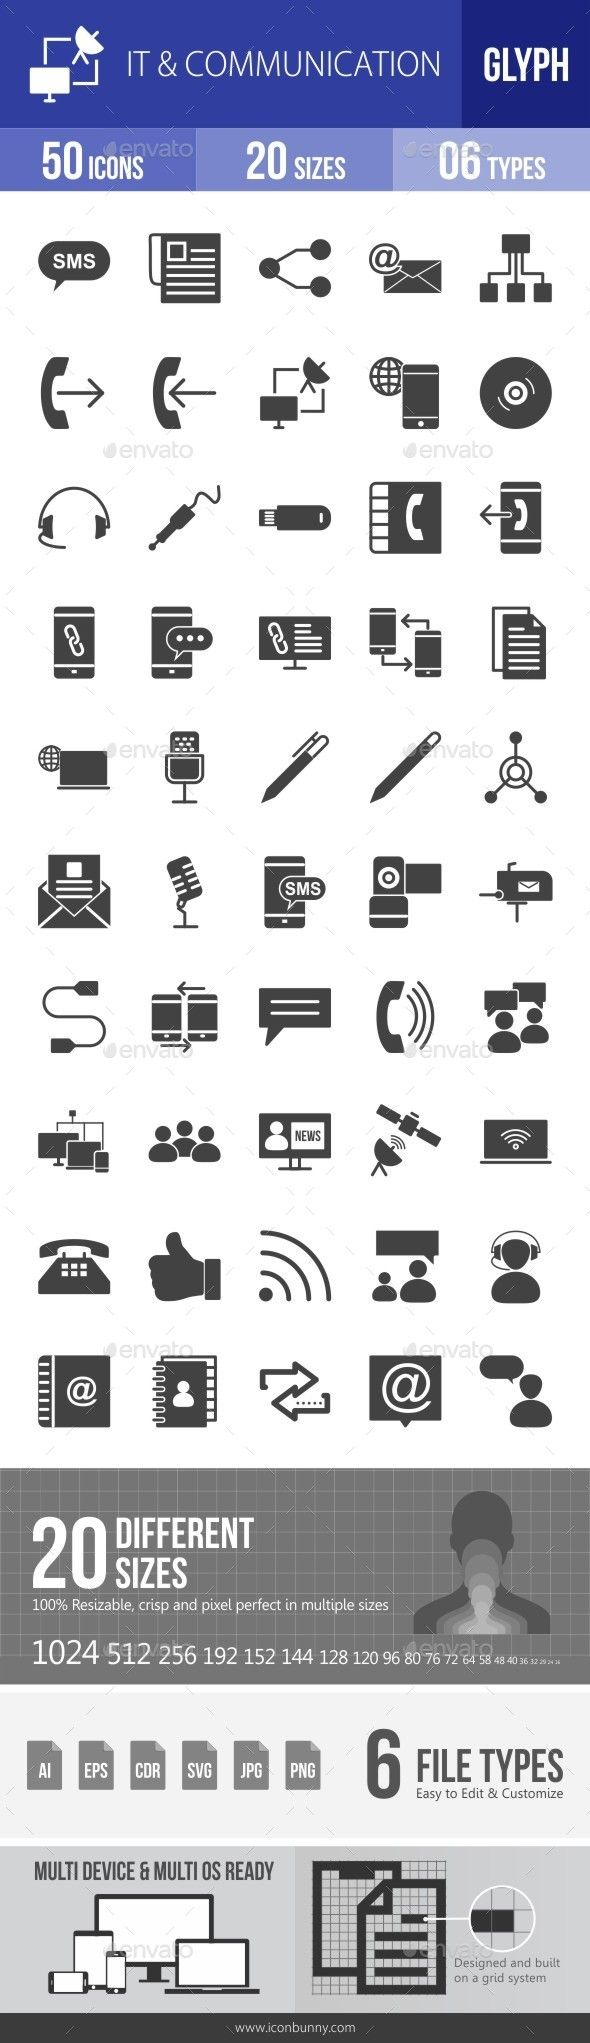 IT & Communication Glyph Icons